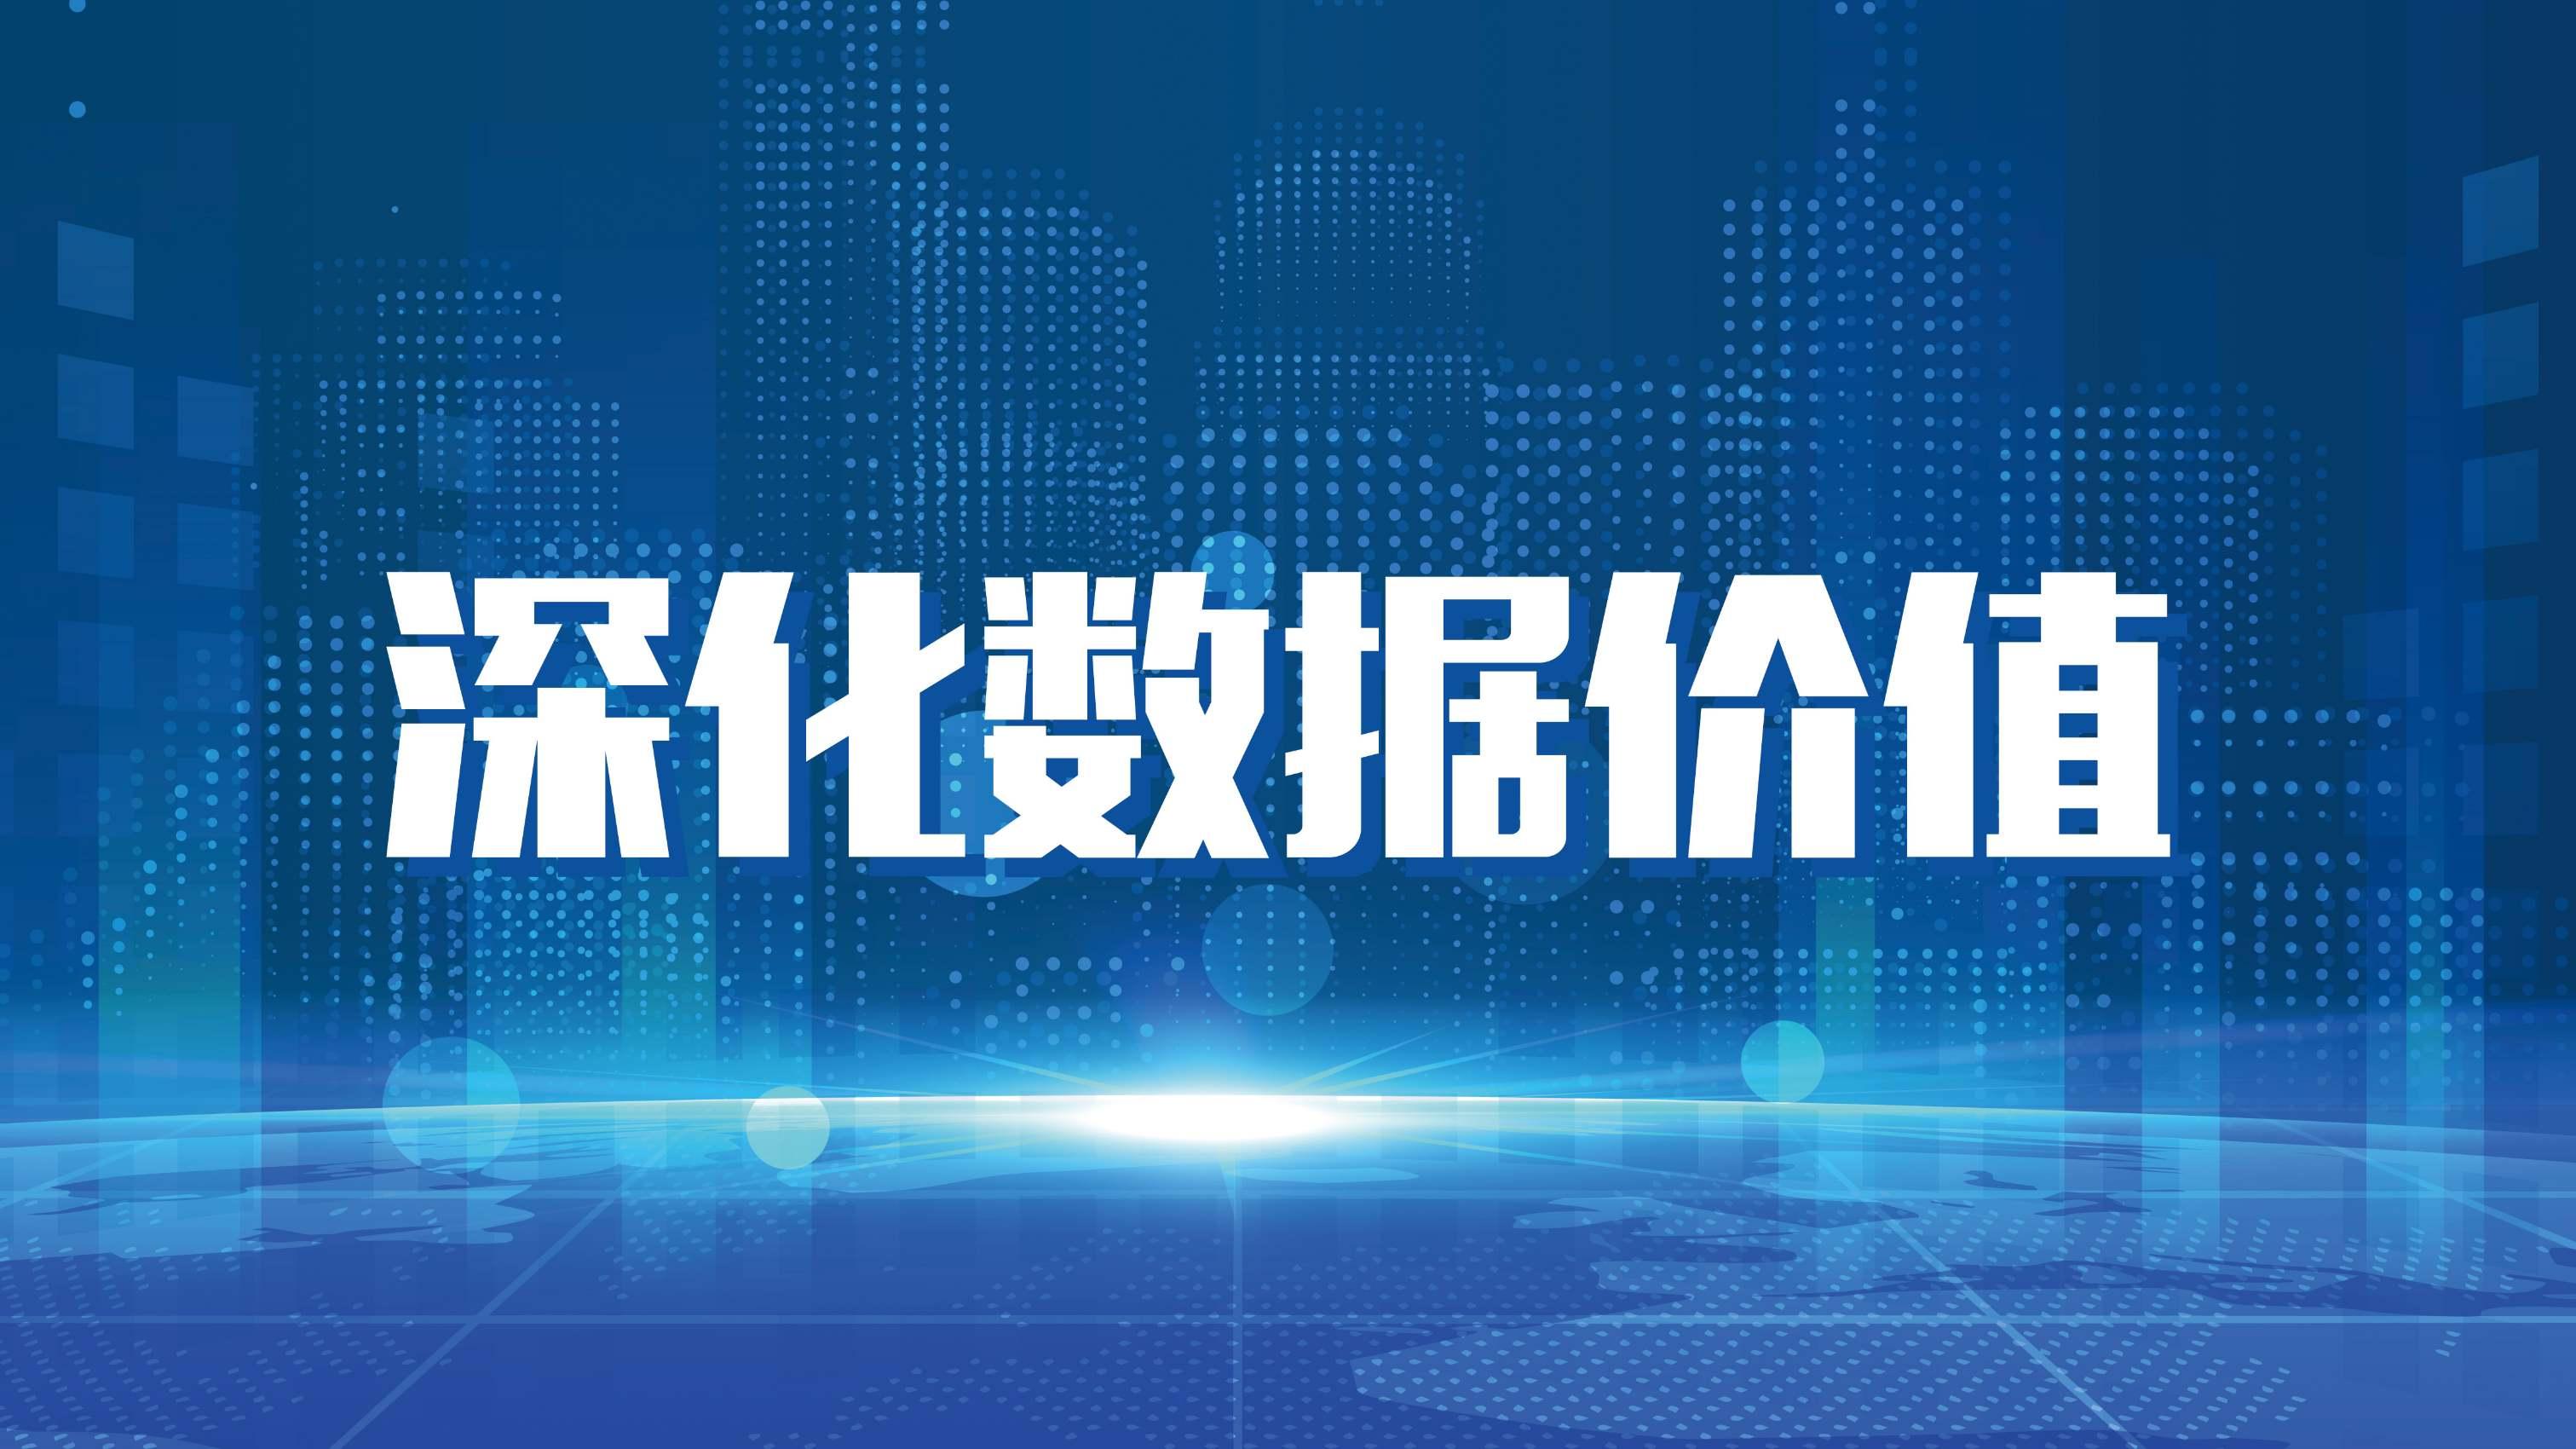 https://timcloud.oss-cn-shanghai.aliyuncs.com/file/iot4/picture/2021/4/20/1618901328252.jpg